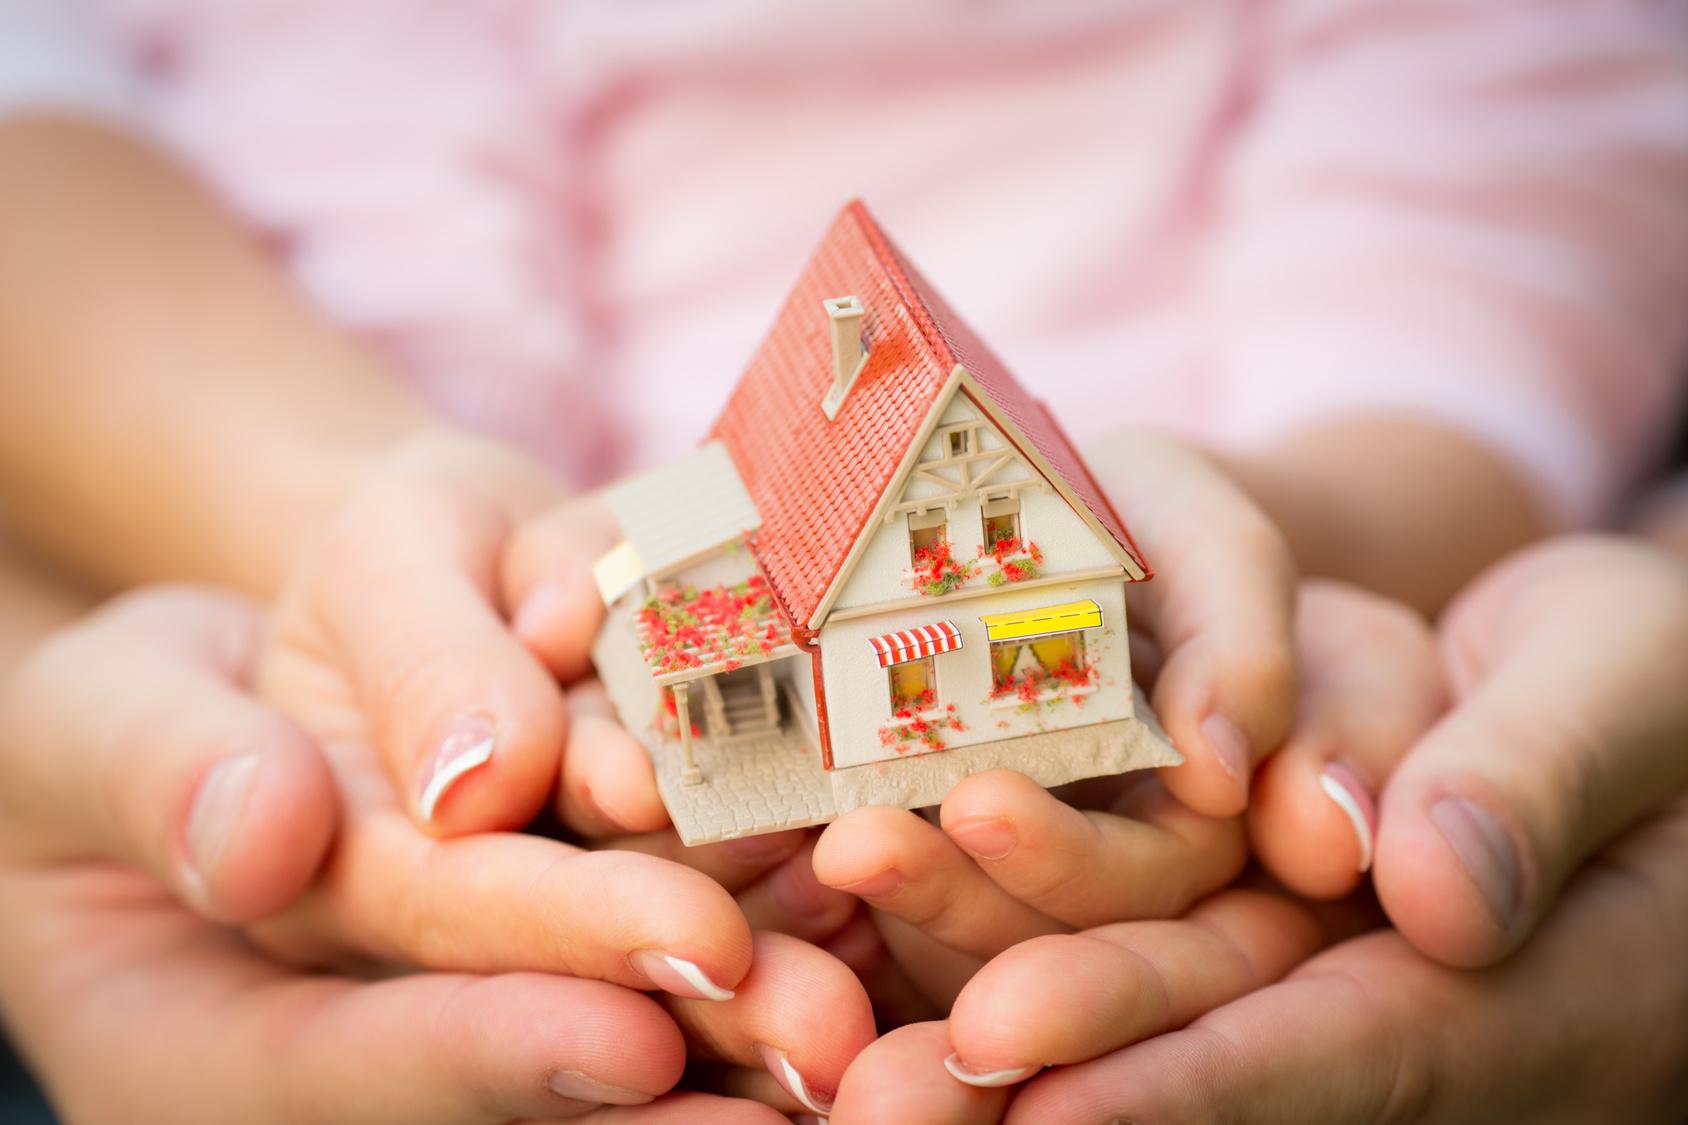 Sicurezza in casa con i bambiniu2026 mammaonair